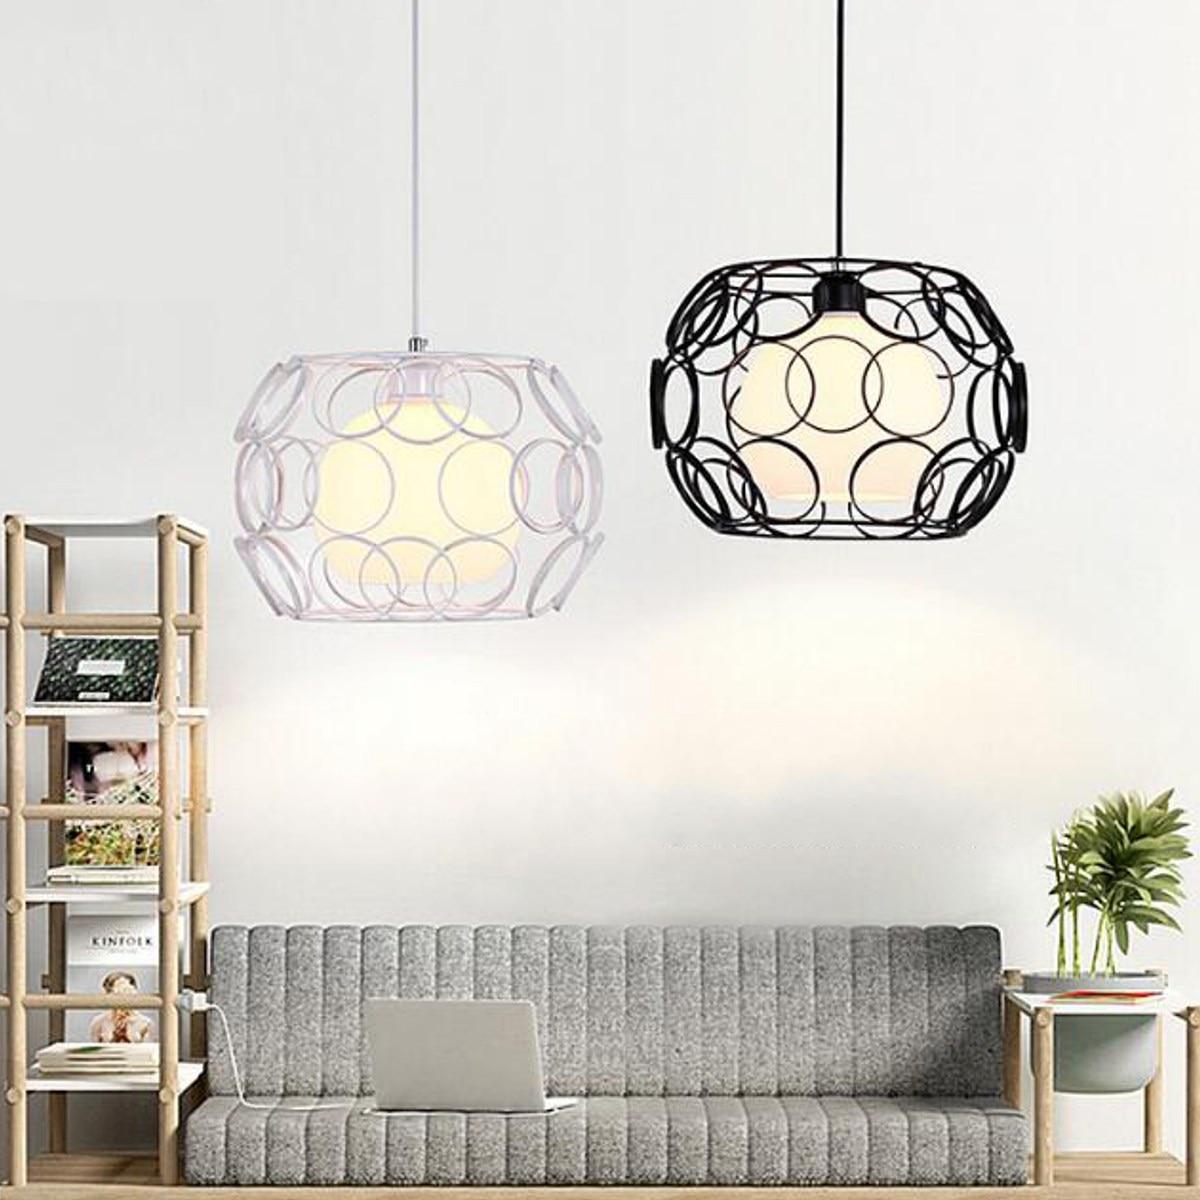 Personality Edison Bulb Pendant Lamps Restaurant Bar Cafe Lamps Rattan Field Pasta Ball E27 LED Pendant Light<br>